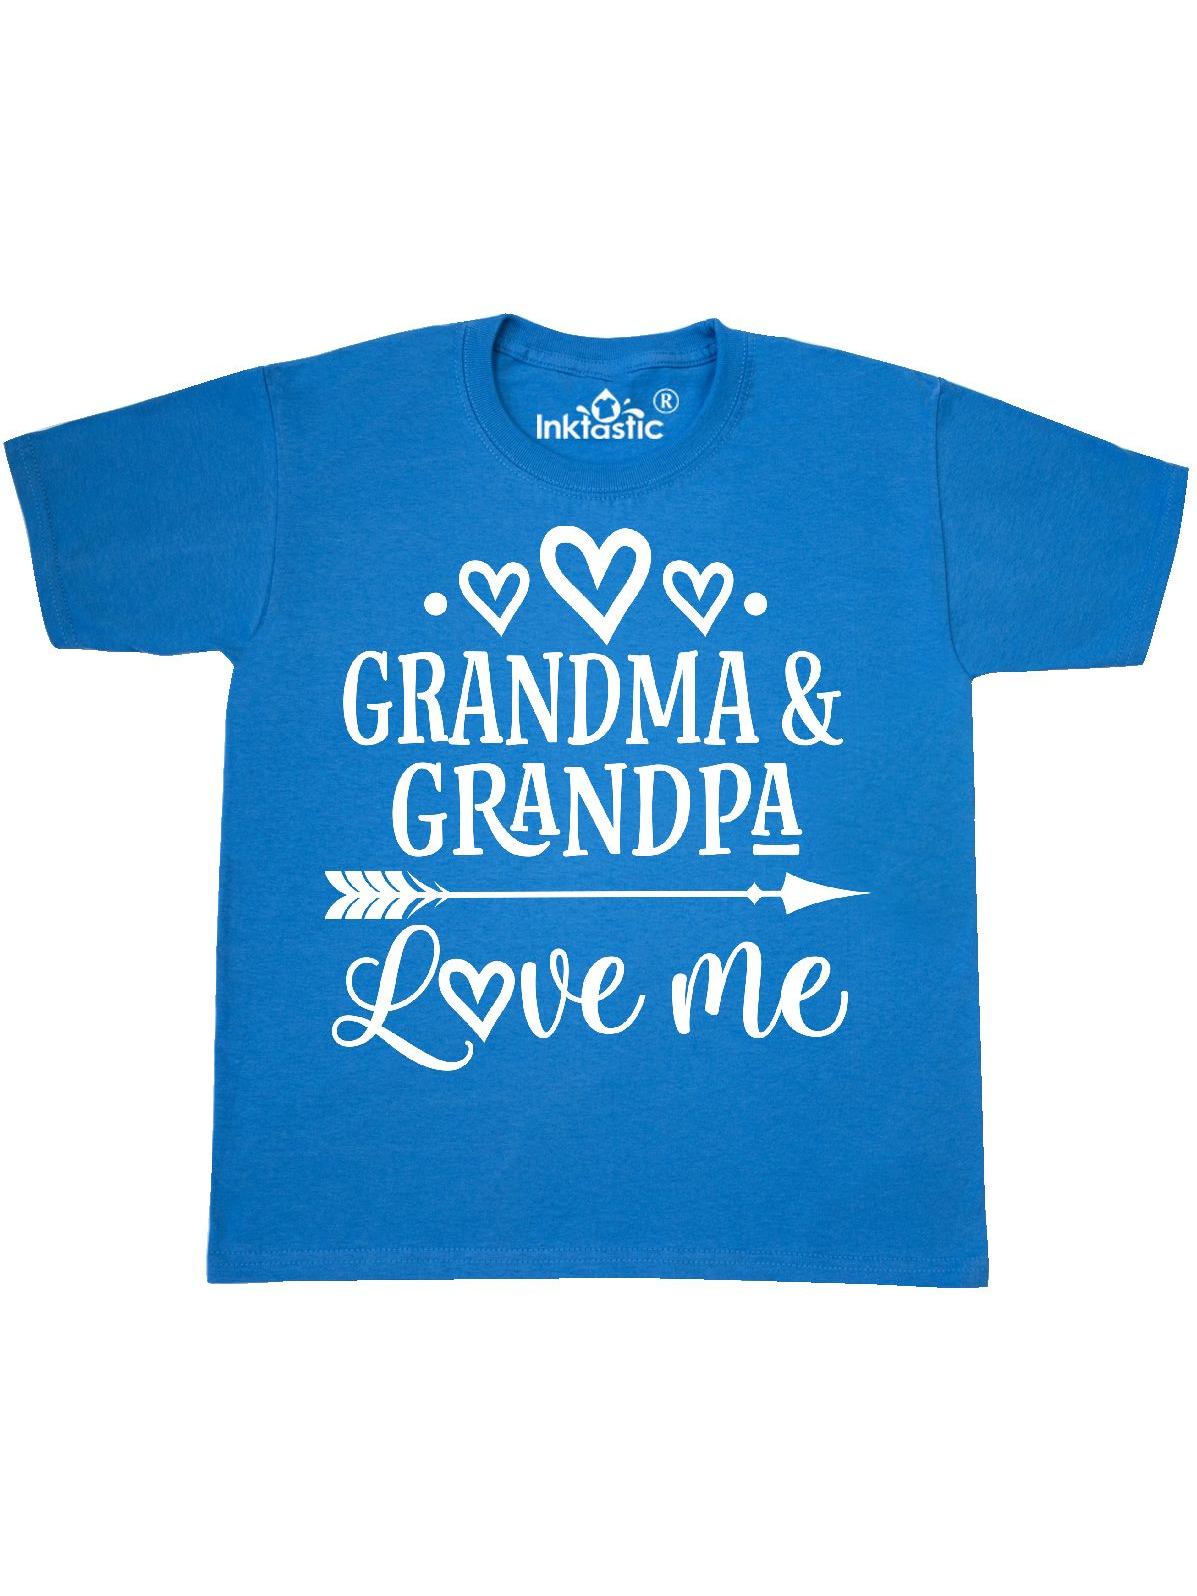 Grandma Grandpa Love Me Grandchild Youth T-Shirt